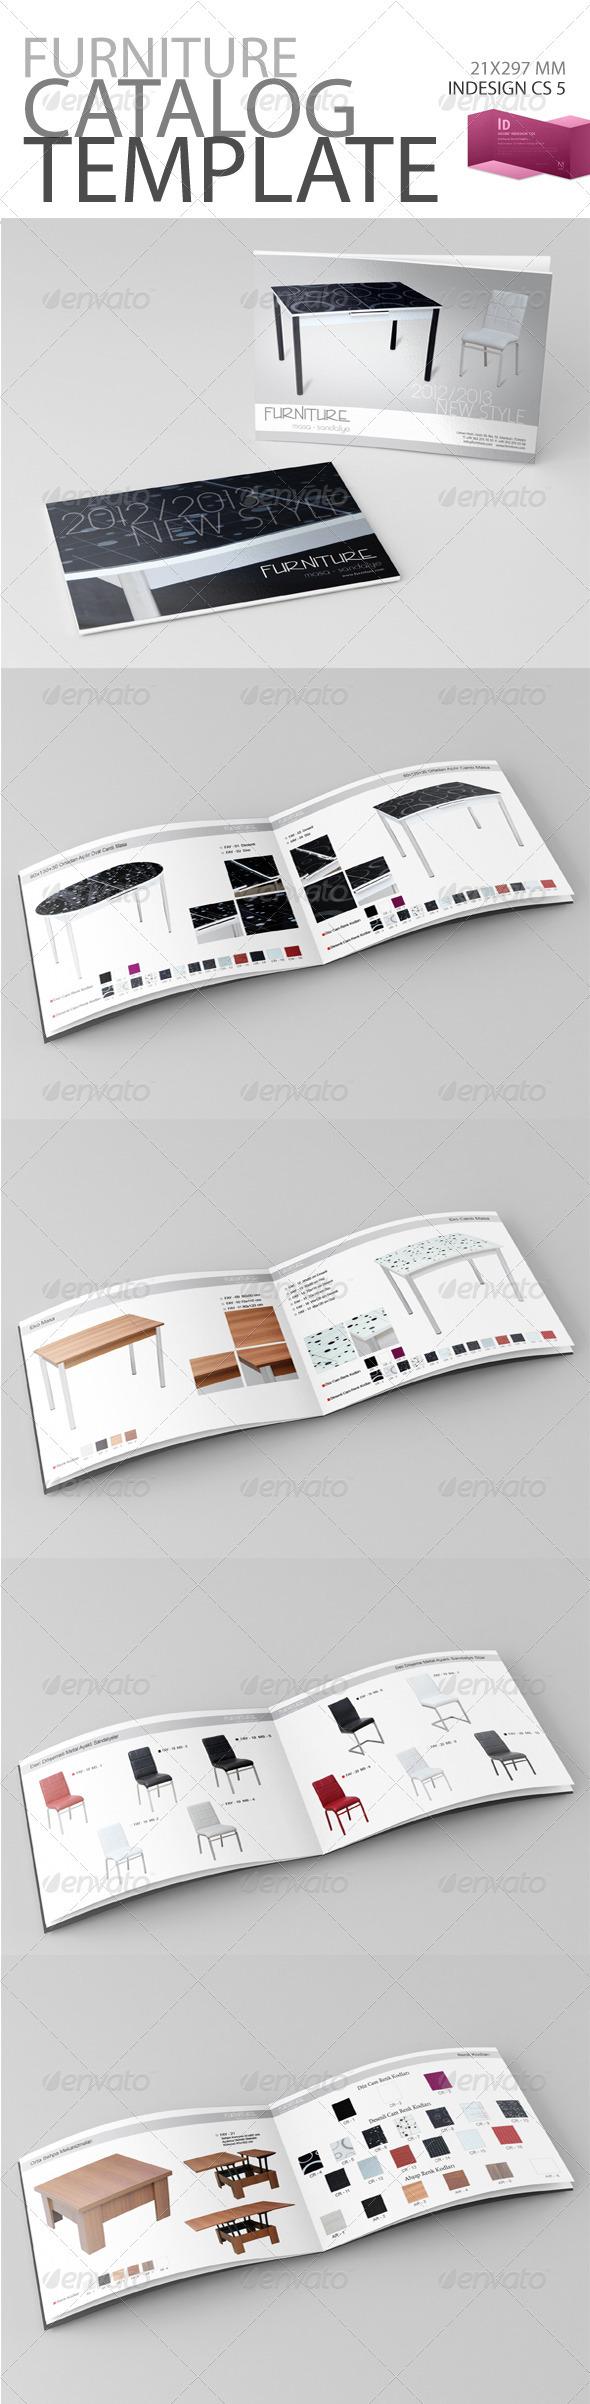 Furniture Catalog Template - Catalogs Brochures